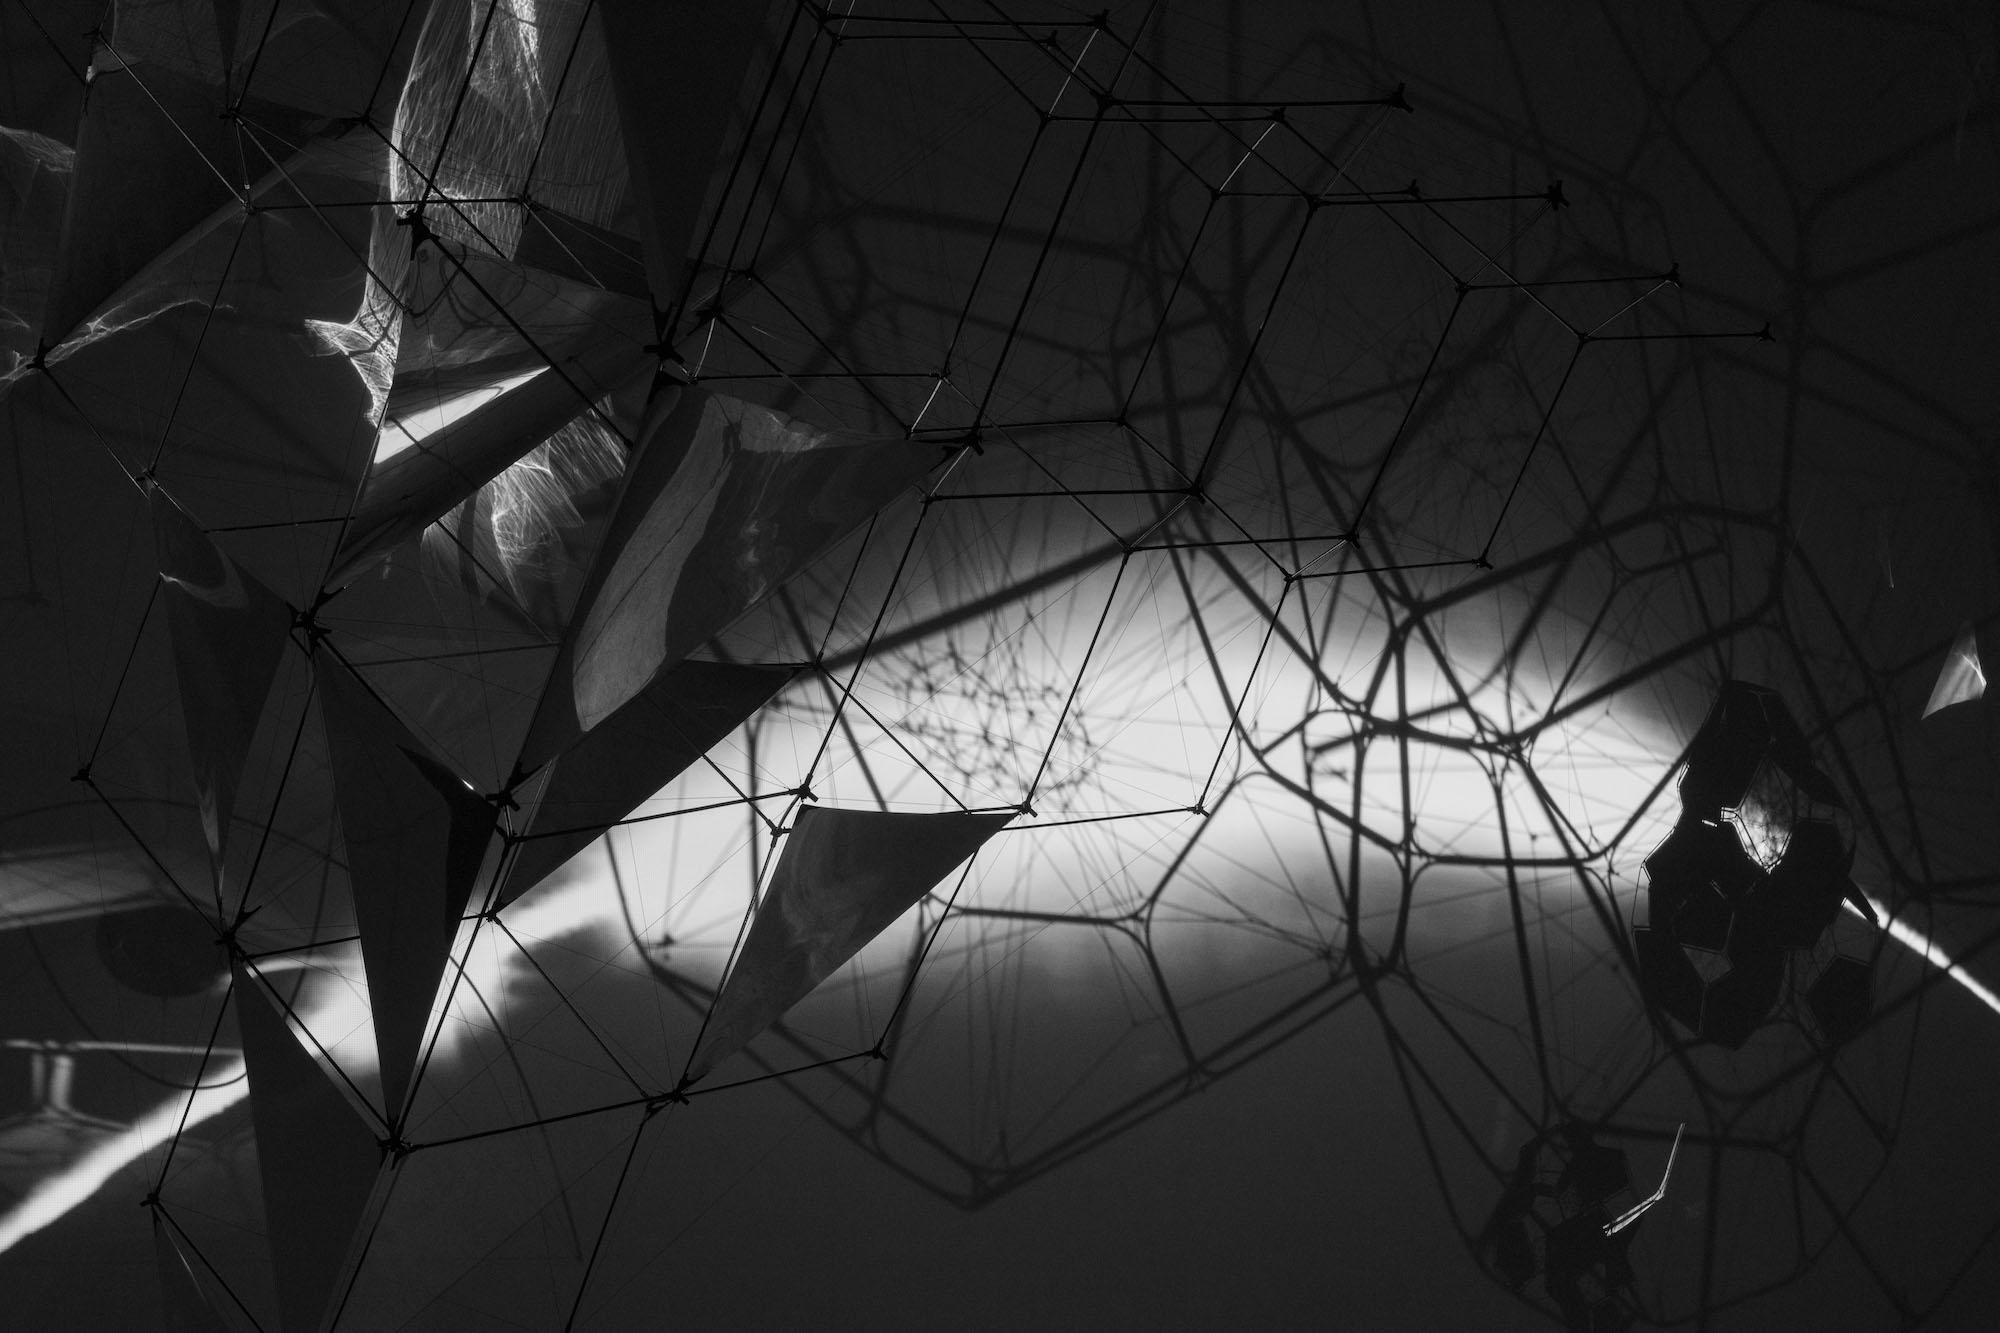 Tomás Saraceno ON AIR, solo exhibition at Palais de Tokyo, Paris, 2018, curated by Rebecca Lamarche-Vadel. Courtesy the artist; Andersen's, Copenhagen; Esther Schipper, Berlin; Pinksummer Contemporary Art, Genoa; Ruth Benzacar, Buenos Aires; Tanya Bonakdar Gallery, New York. © Photography Studio Tomás Saraceno, 2018